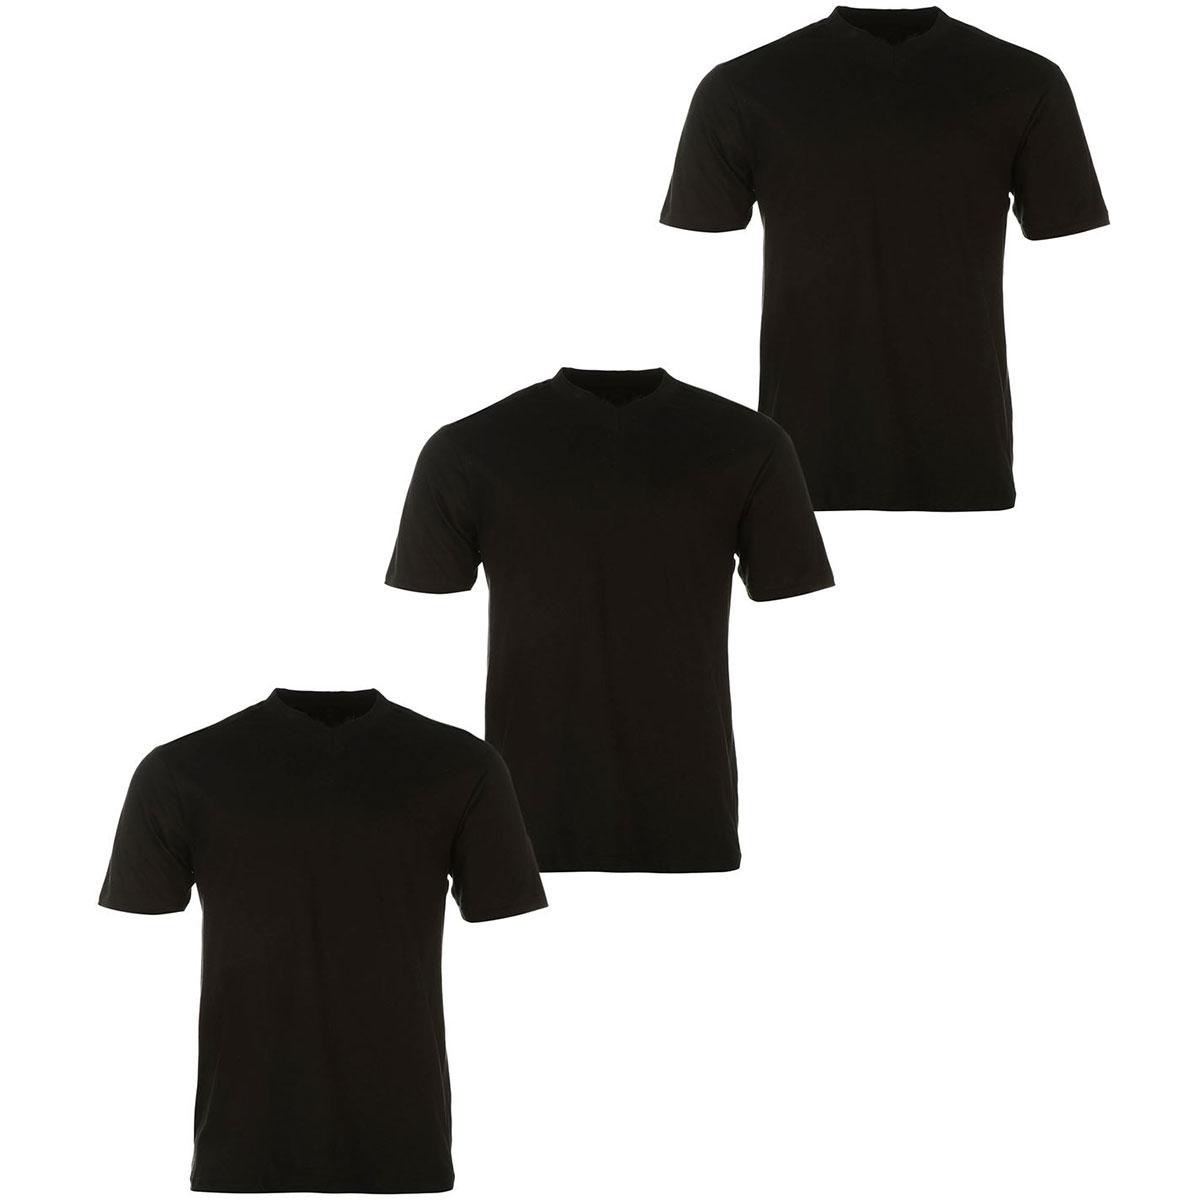 Donnay Men's V-Neck Short-Sleeve Tees, 3-Pack - Black, S